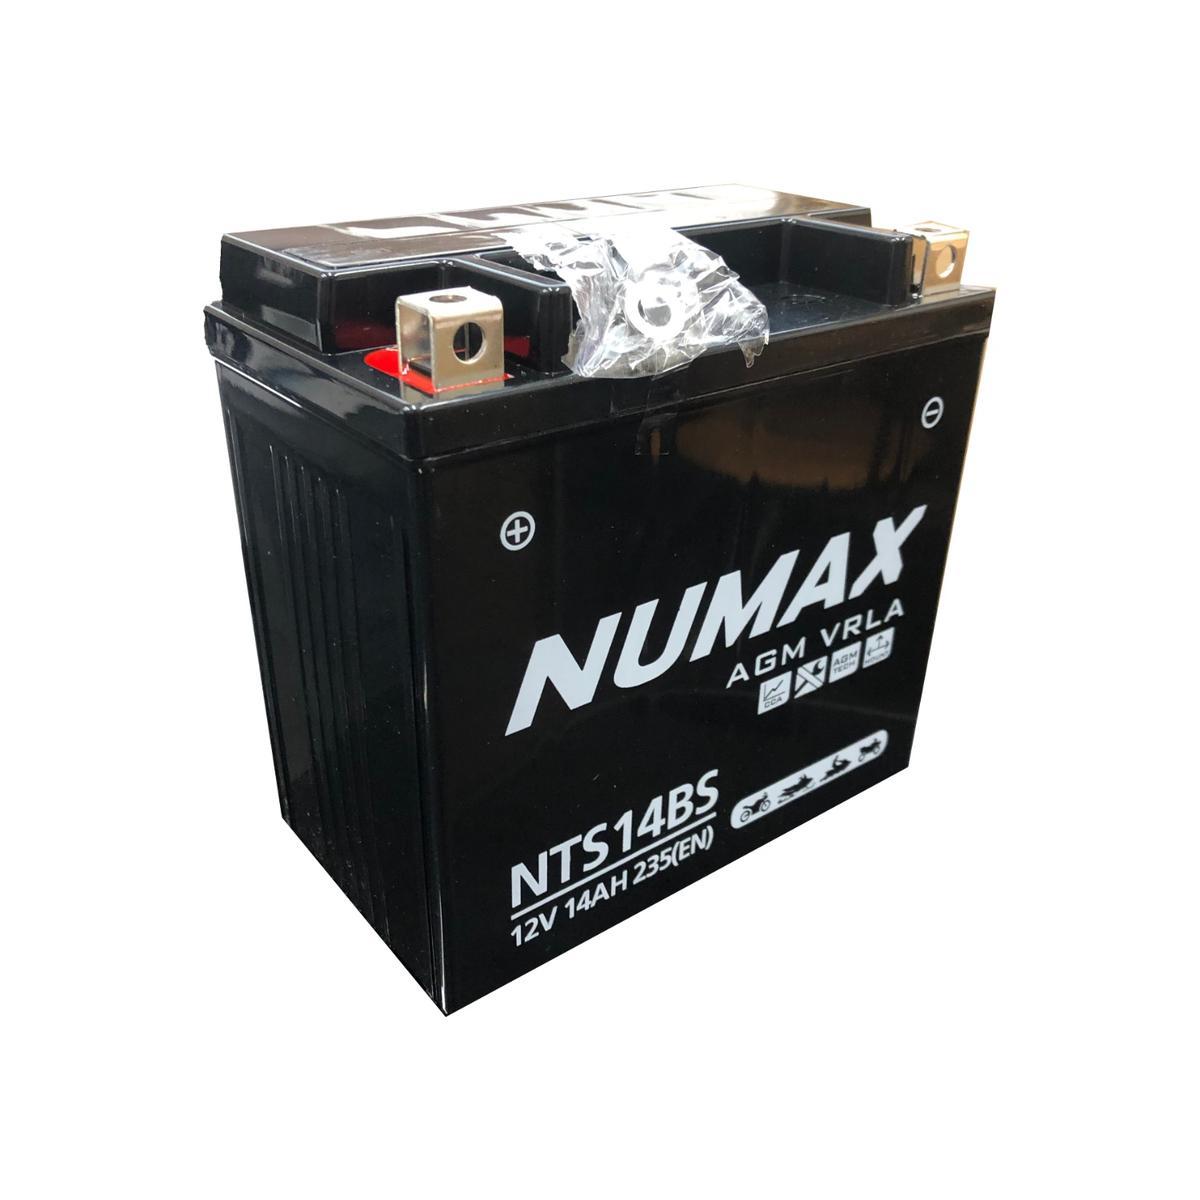 Numax NTS14BS 12v Motorbike Bike Battery YAMAHA 1000cc YZF 1000R YTX14-4